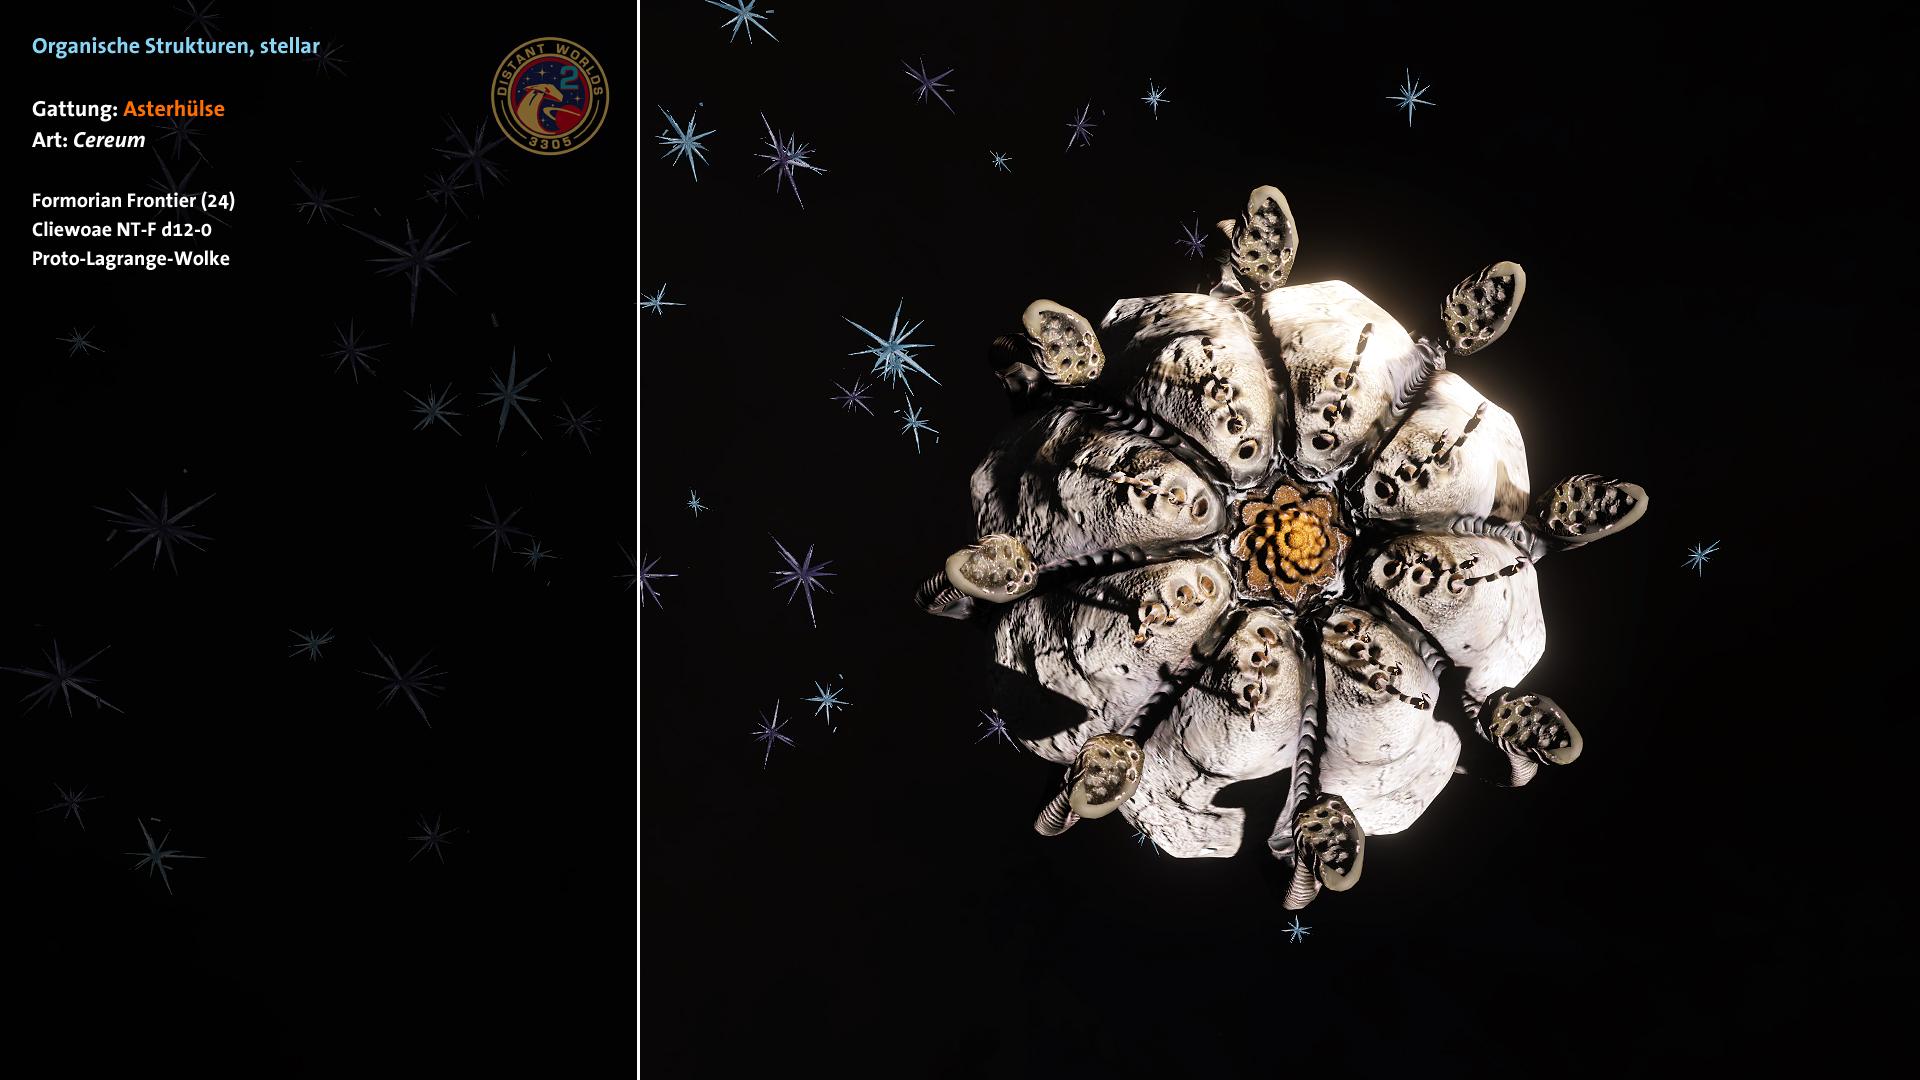 dw2-09-008-biostellarldk2g.jpg